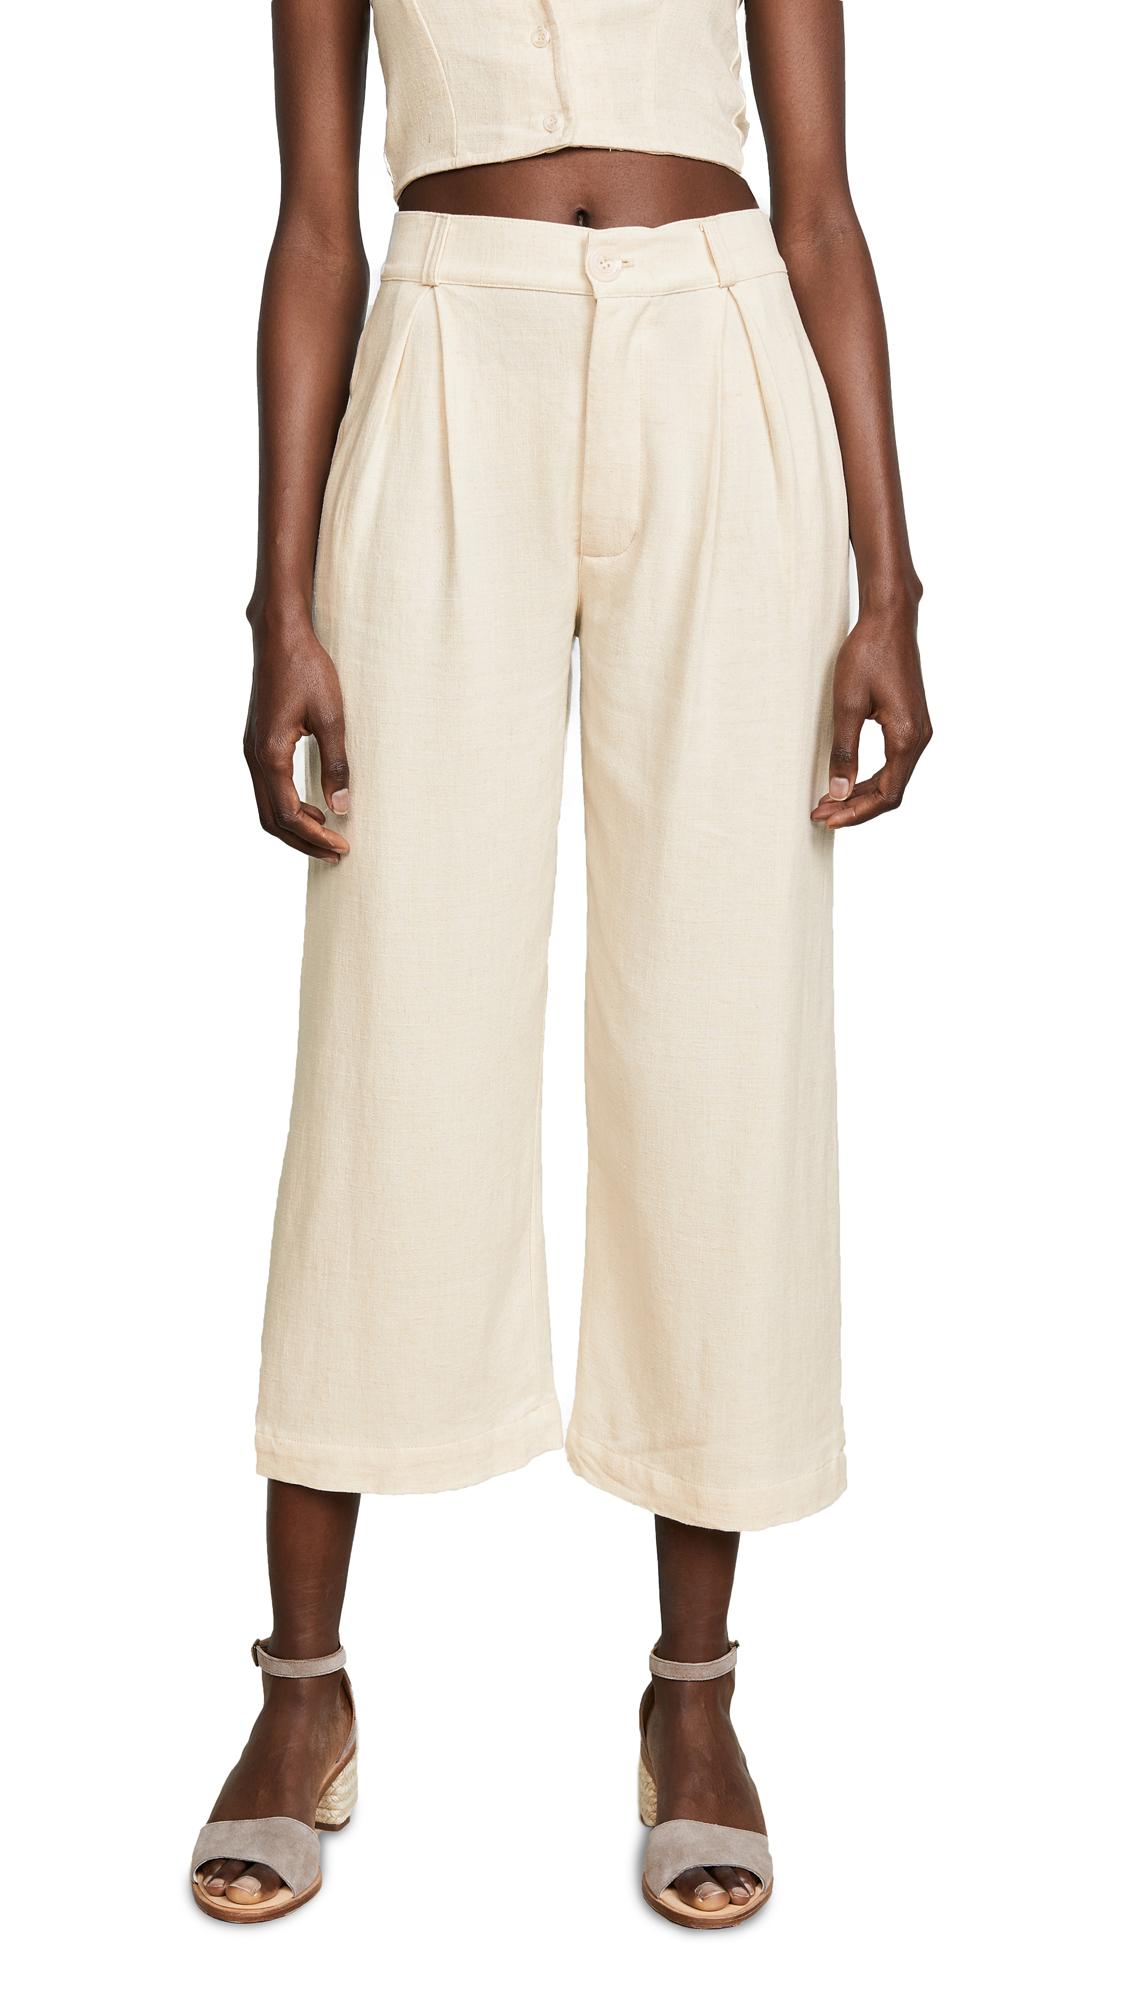 RACHEL PALLY DESIREE PANTS